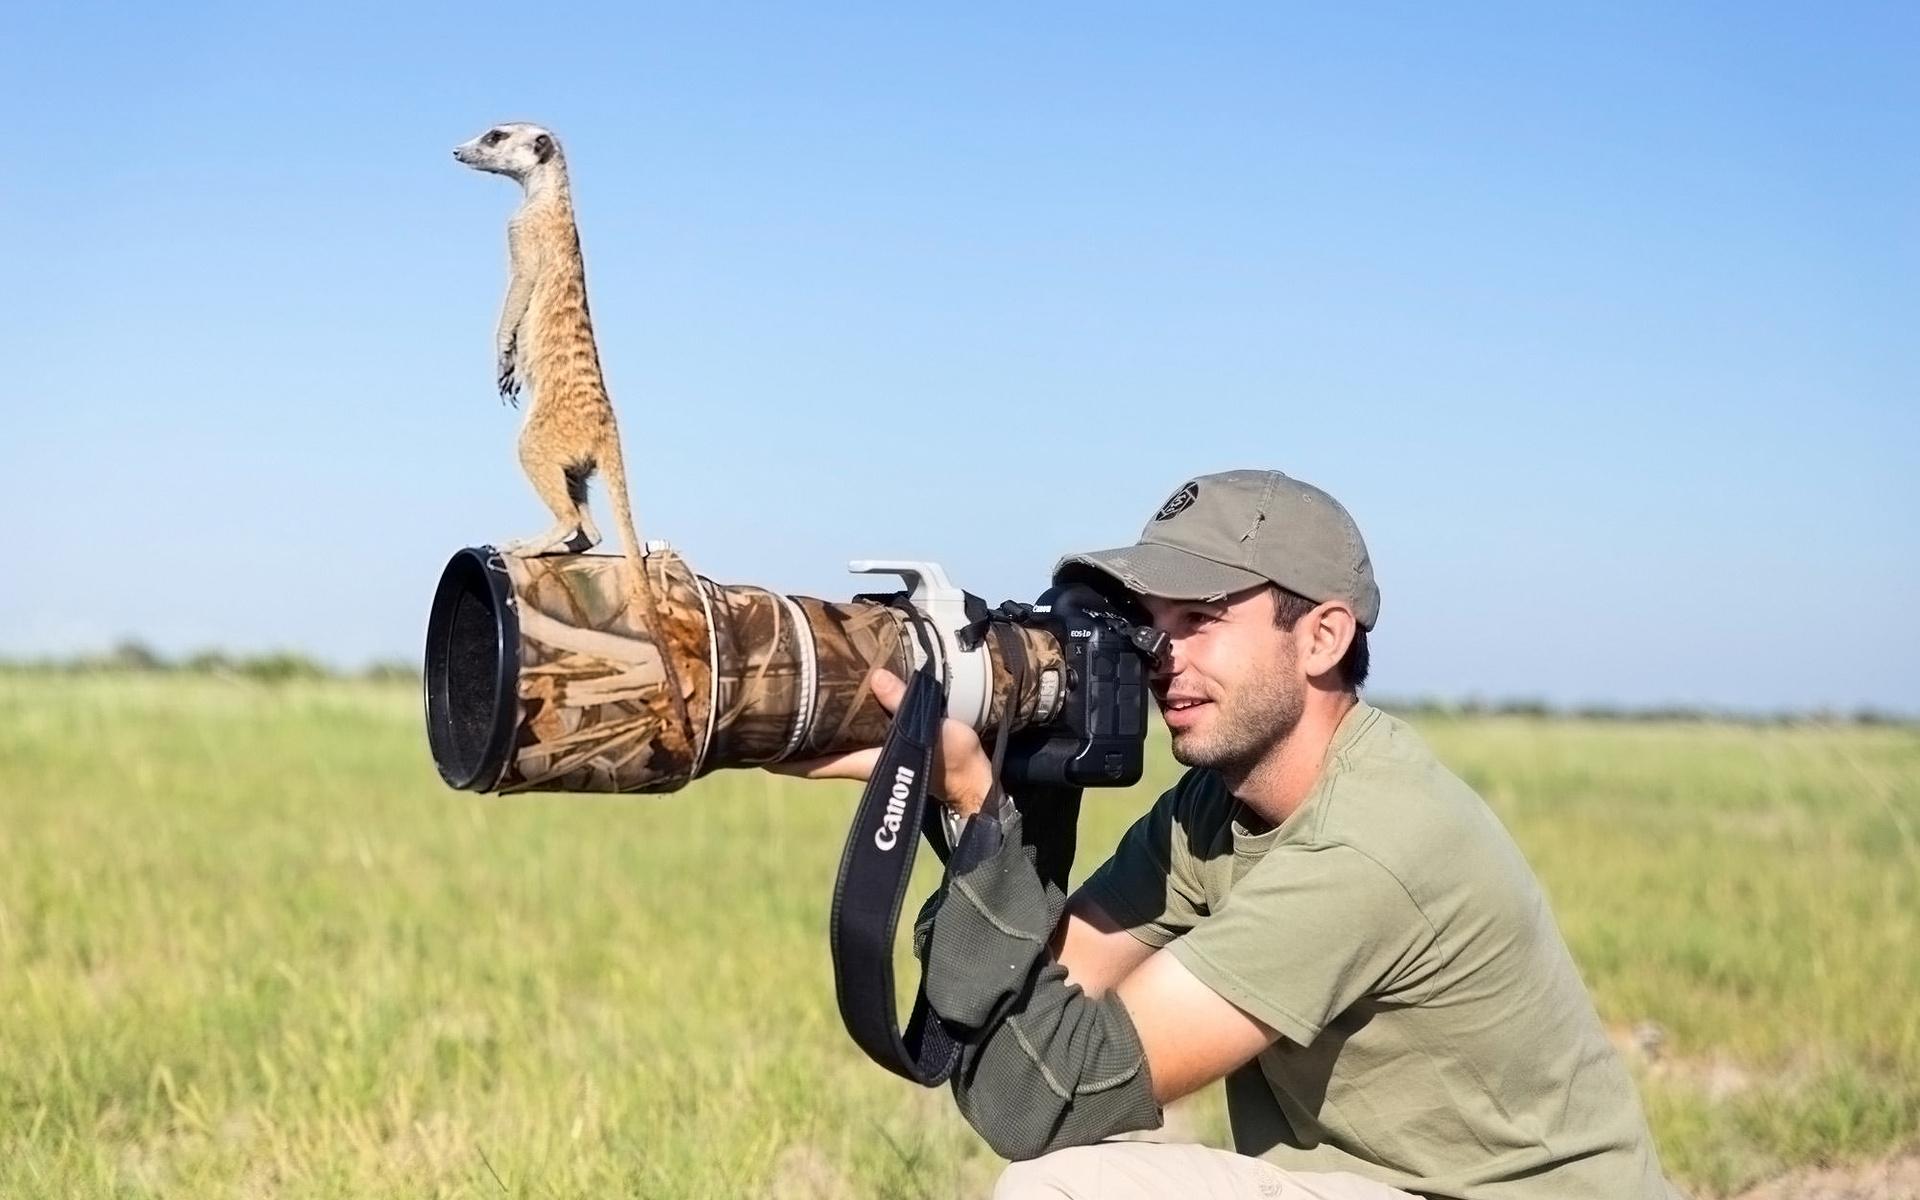 фотограф, фотоаппарат, объектик